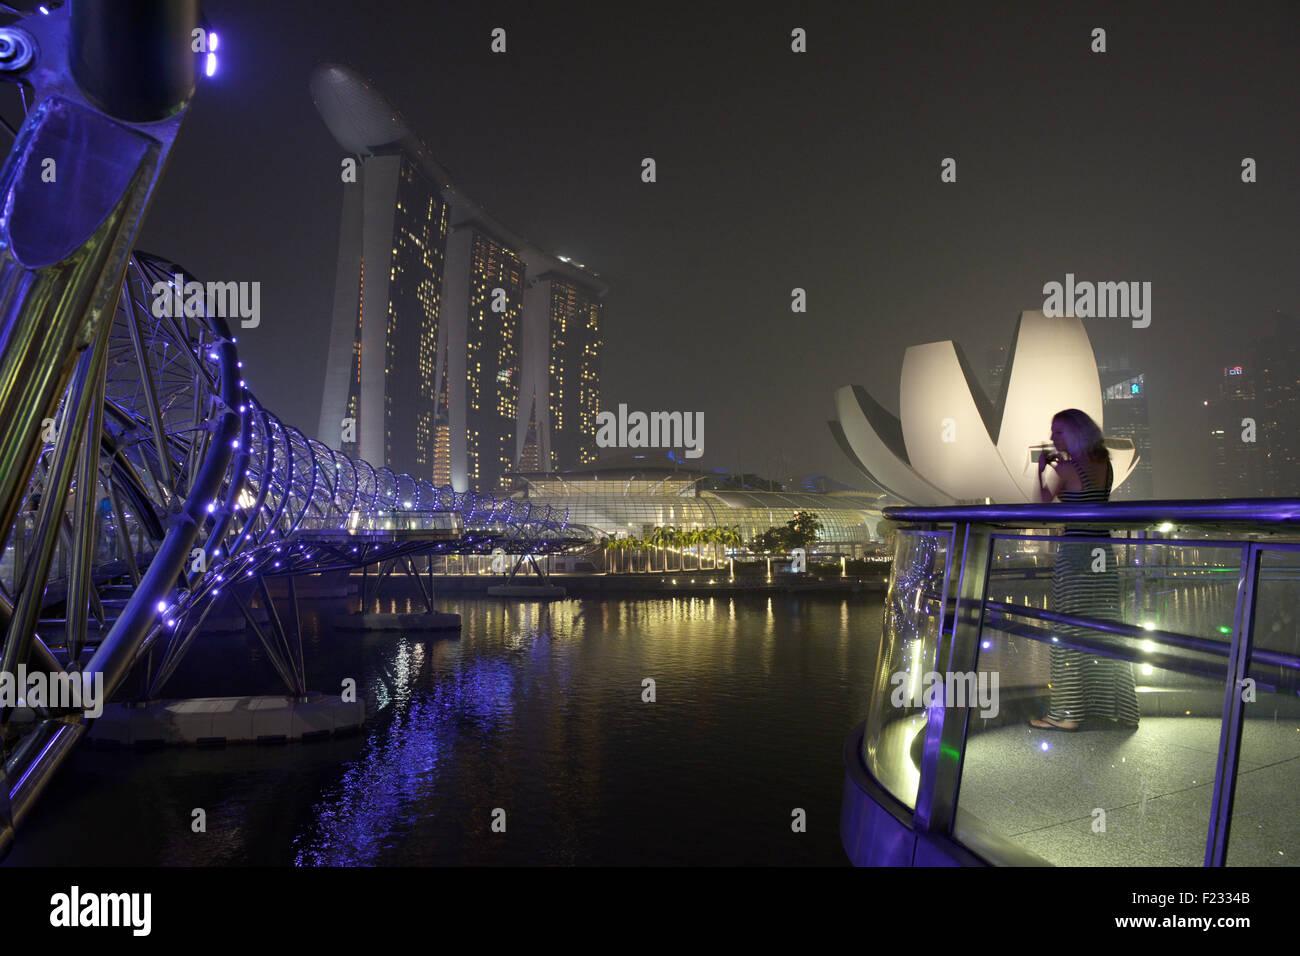 Singapore. 10th Sep, 2015. Haze looms over Singapore's Marina Bay area, Sept. 10, 2015. Singapore's pollution - Stock Image